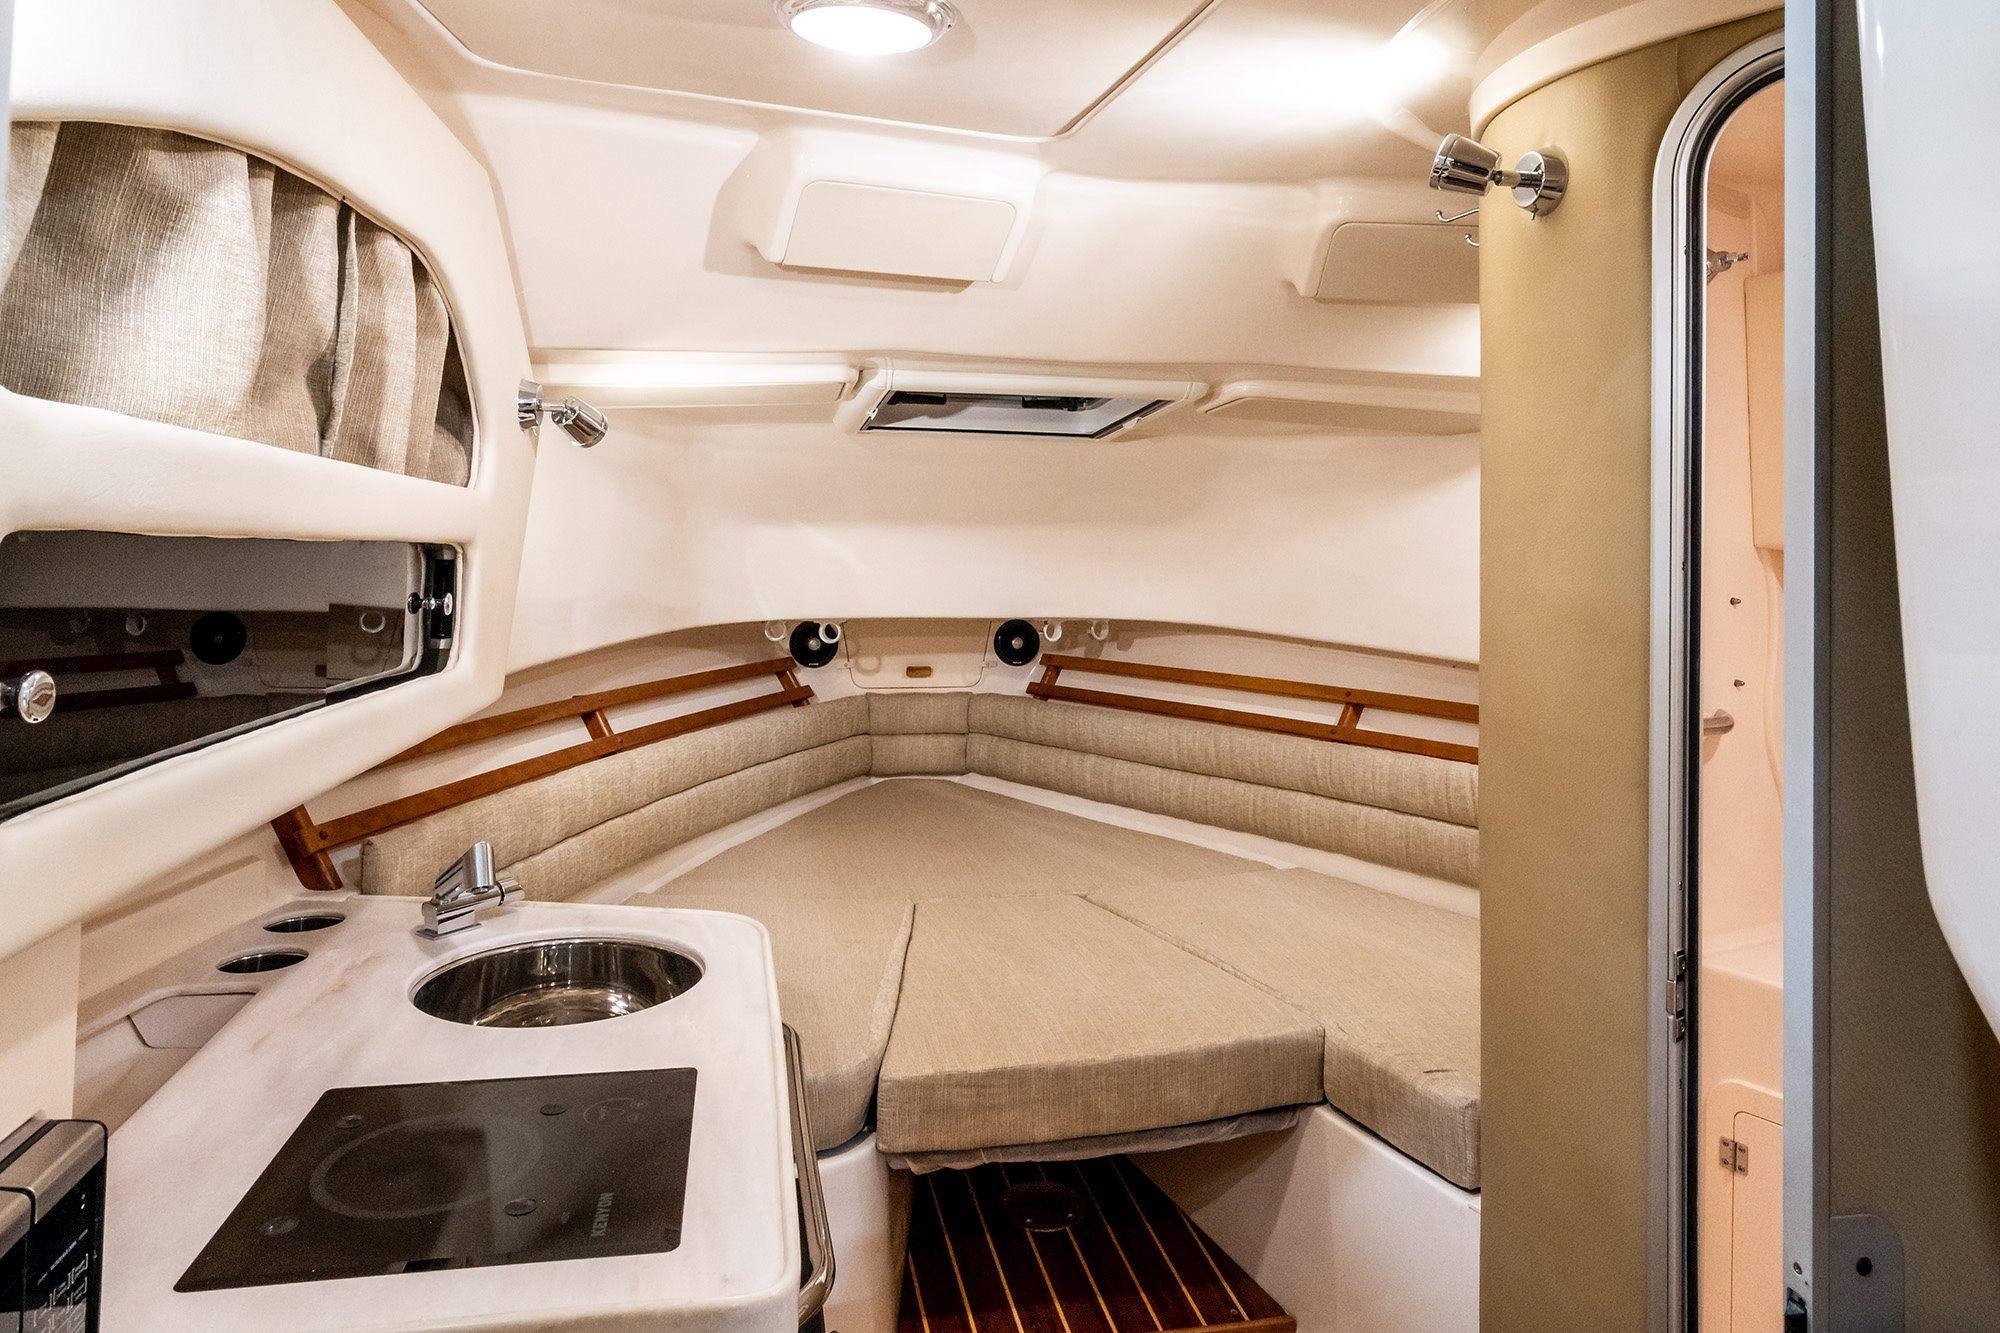 Grady-White | Marlin 300 Walkaround Cabin